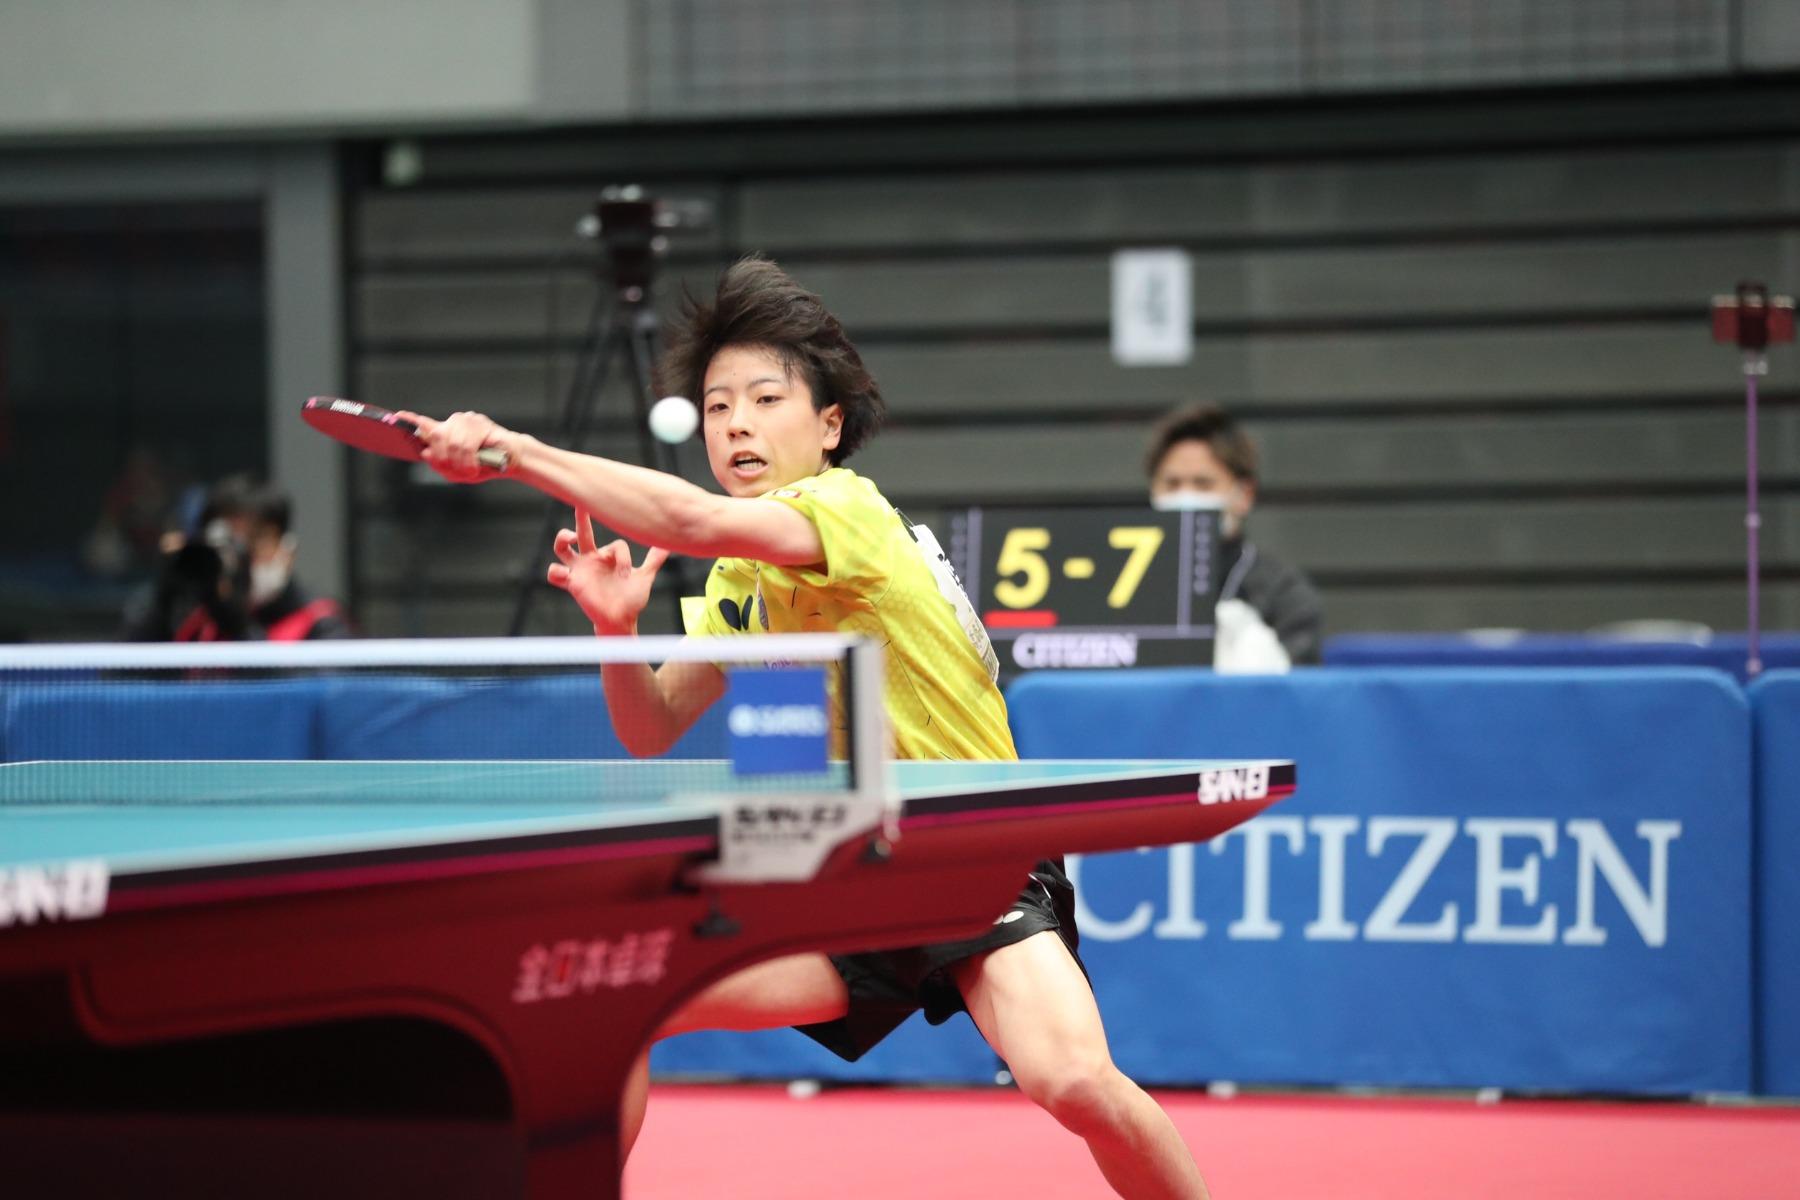 VICTAS 2021年全日本卓球VICTAS特設ページ VICTAS JOURNAL